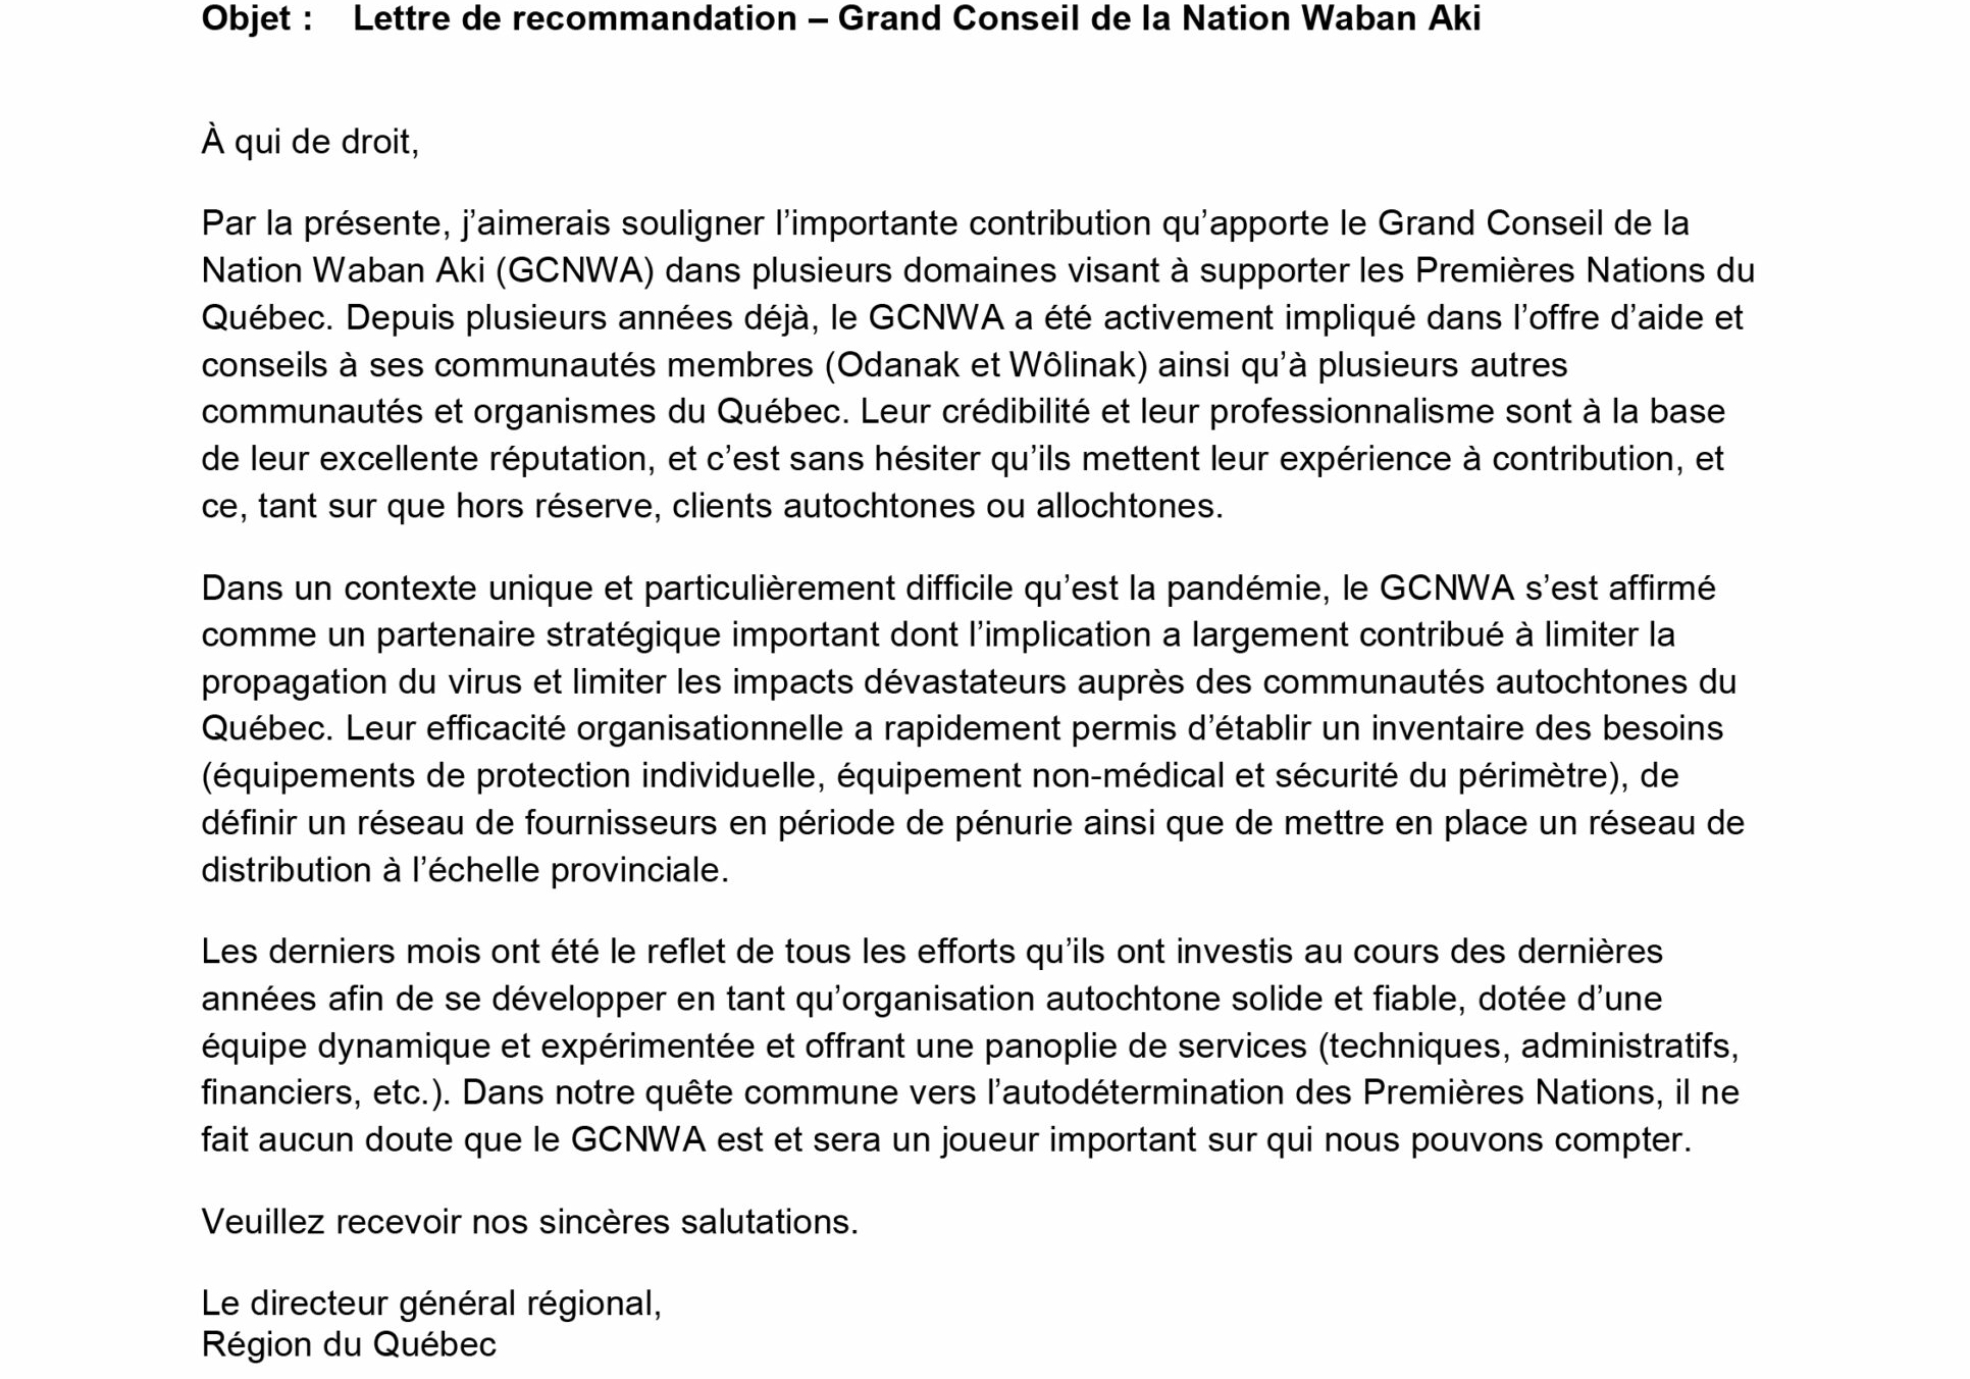 LETTRE-RECOMMANDATION-WABAN-AKI-MARS-2021